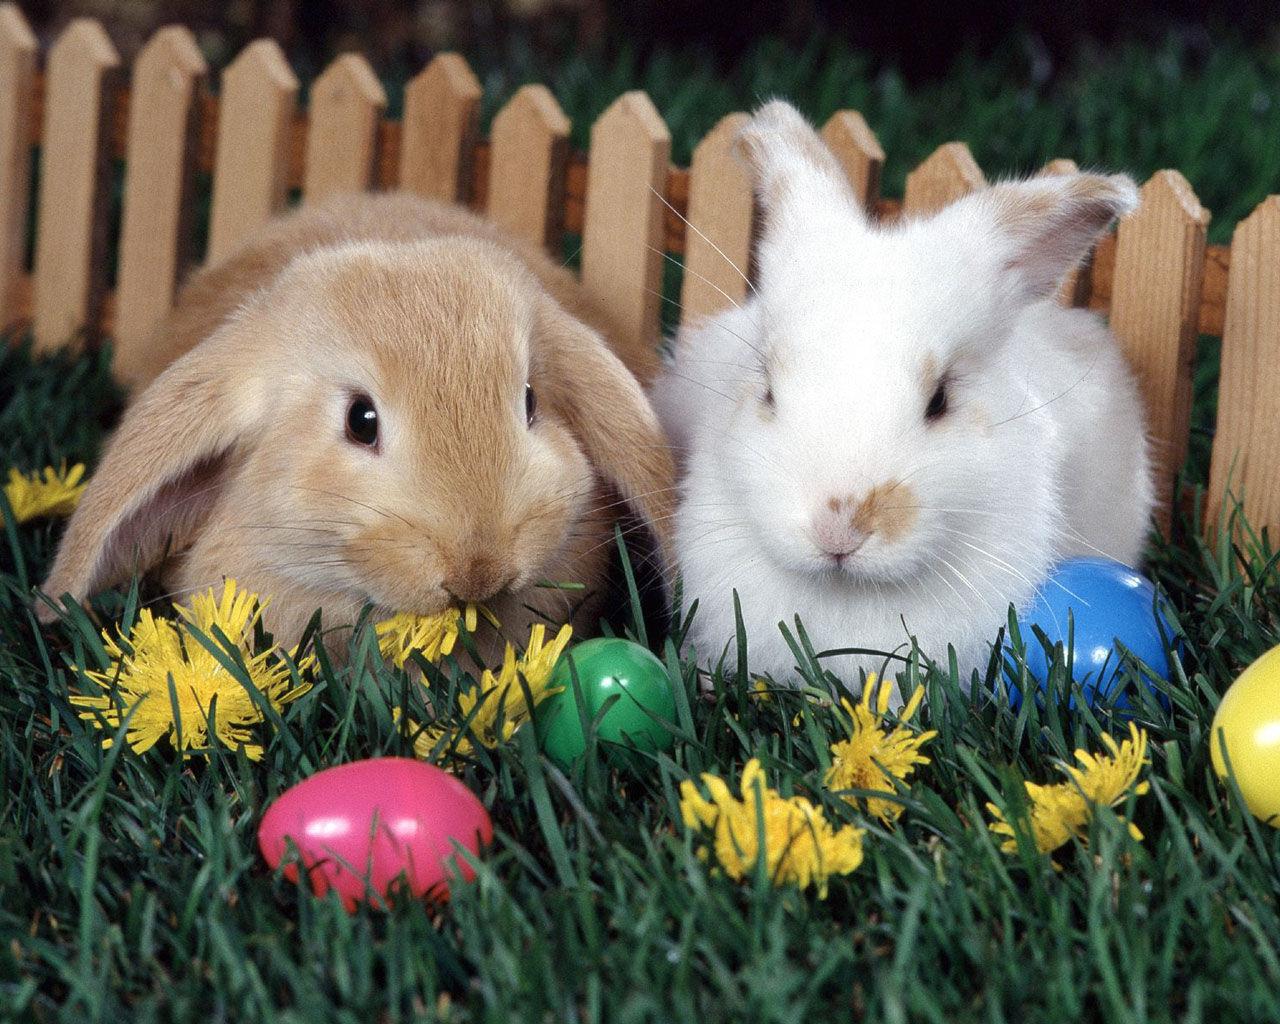 https://4.bp.blogspot.com/_h0GJRWHUFZw/TS9ksGK6SQI/AAAAAAAABIA/4k9pODXDvtg/s1600/2-Rabbits-bunny-rabbits-4233951-1280-1024.jpg